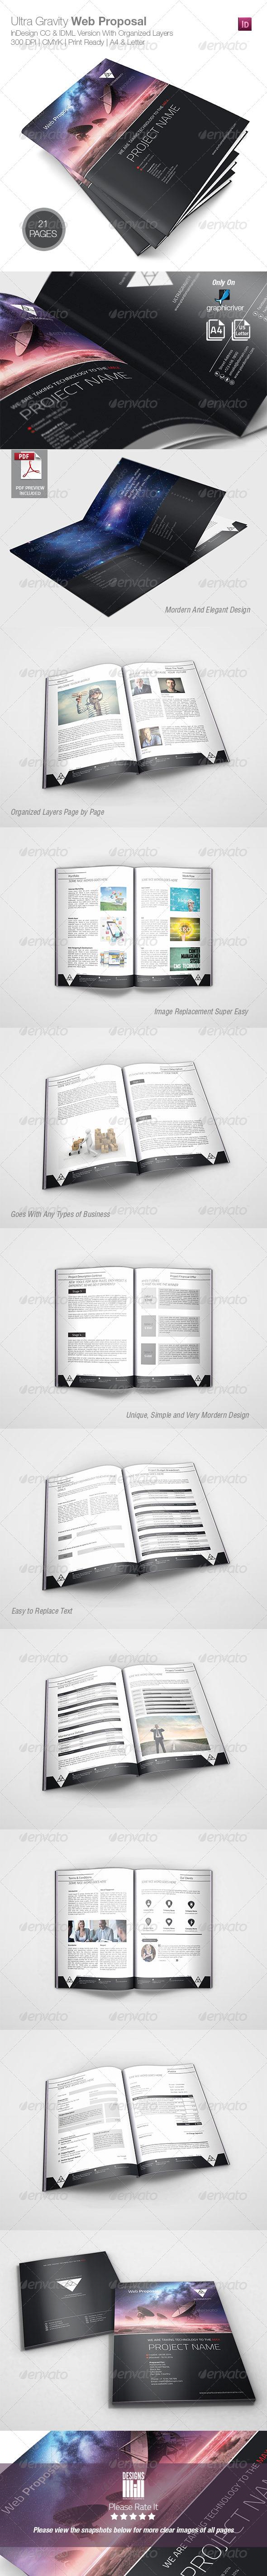 GraphicRiver Ultra Gravity Web Proposal 8373390